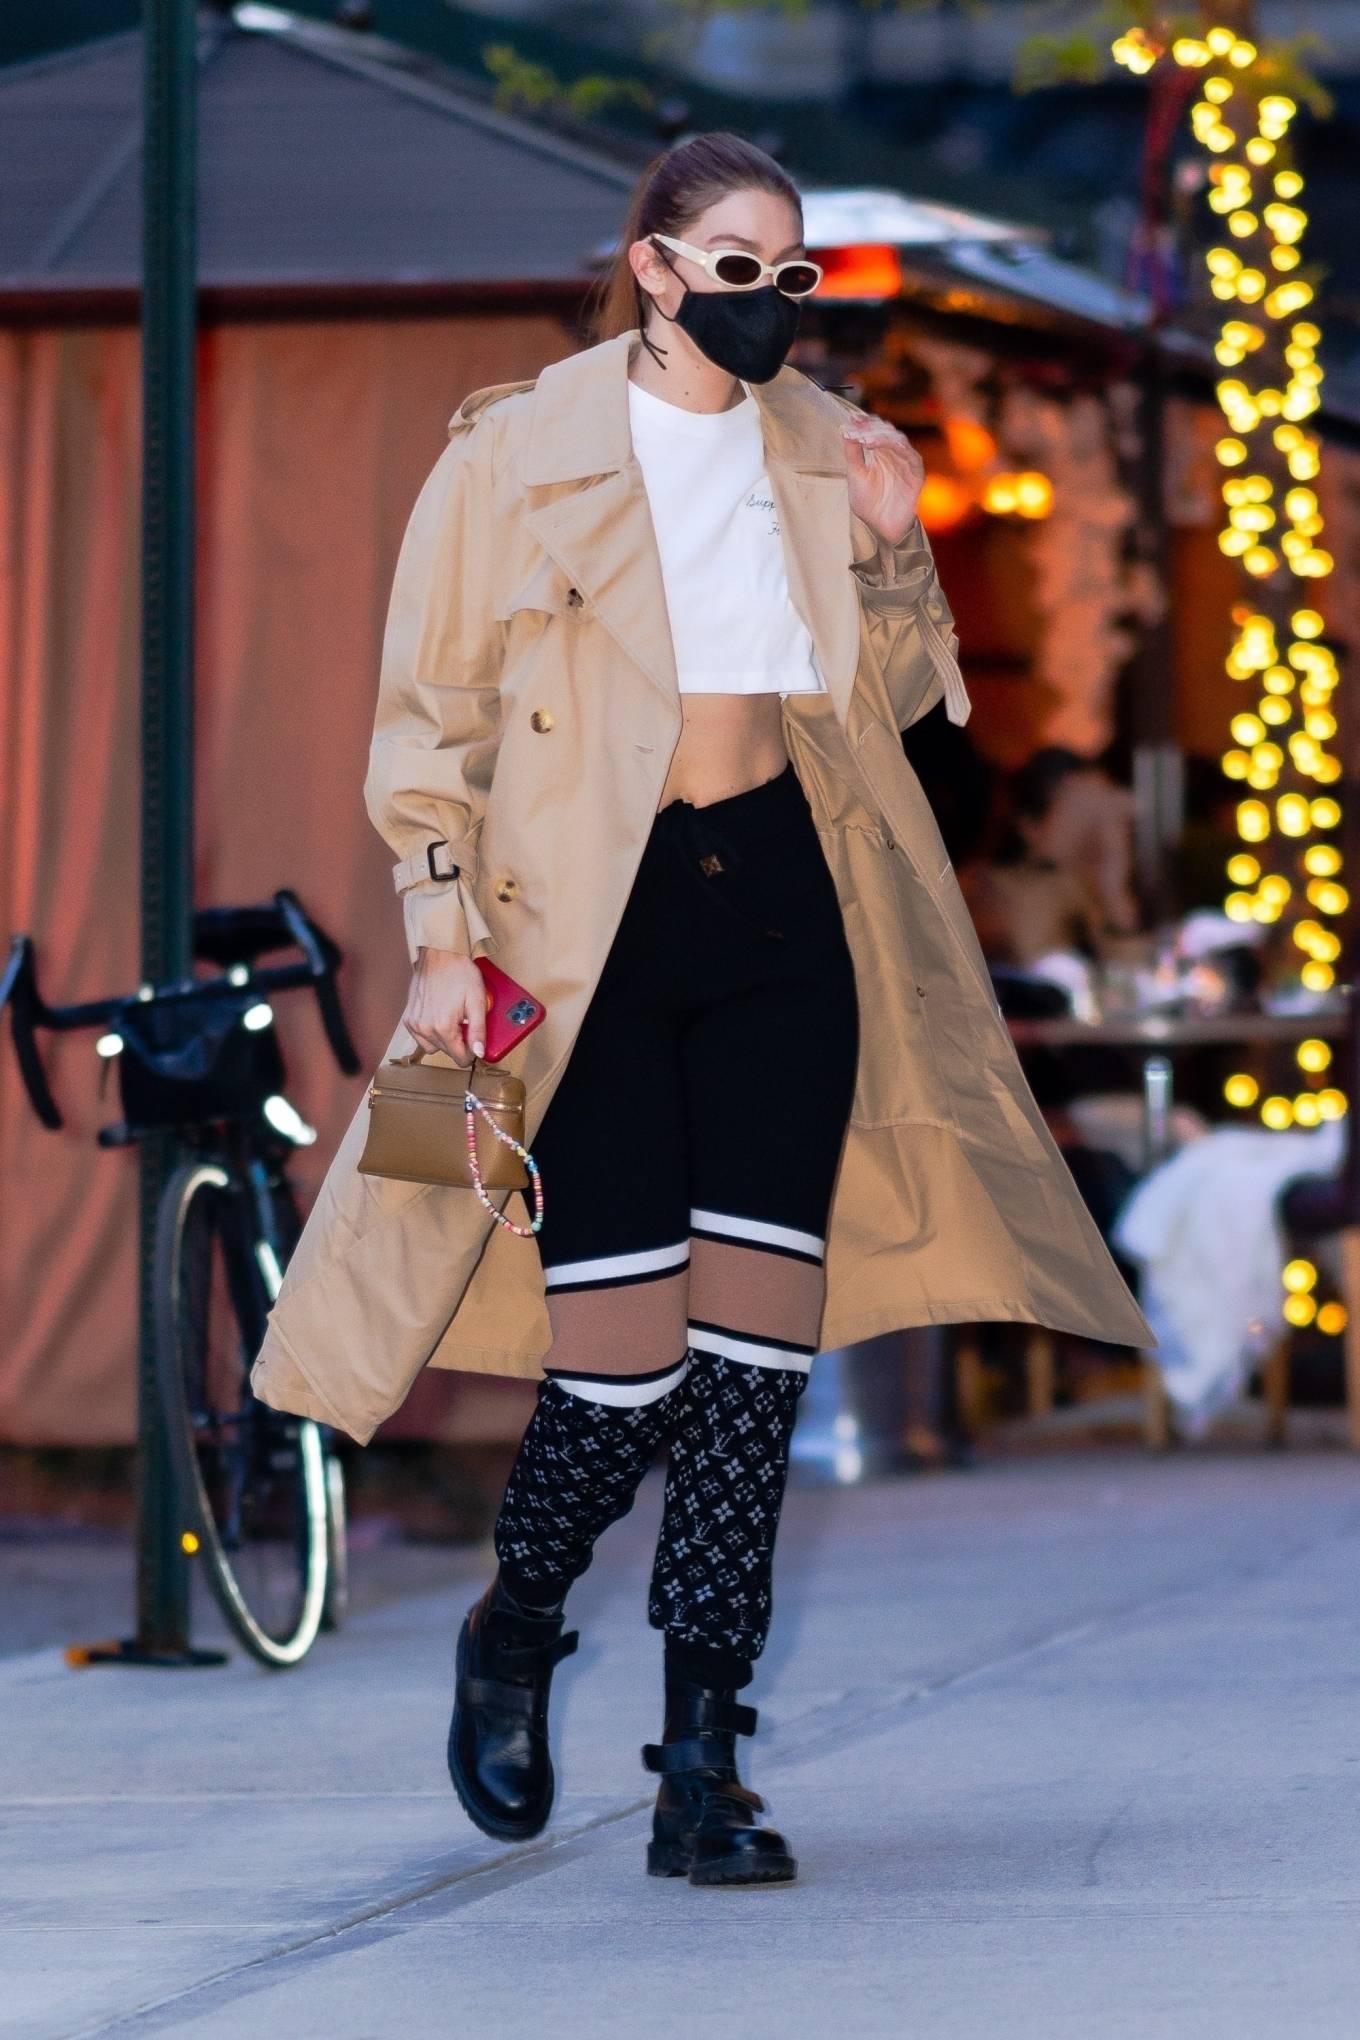 Gigi Hadid 2021 : Gigi Hadid – Seen after shooting for Maybelline in New York-14